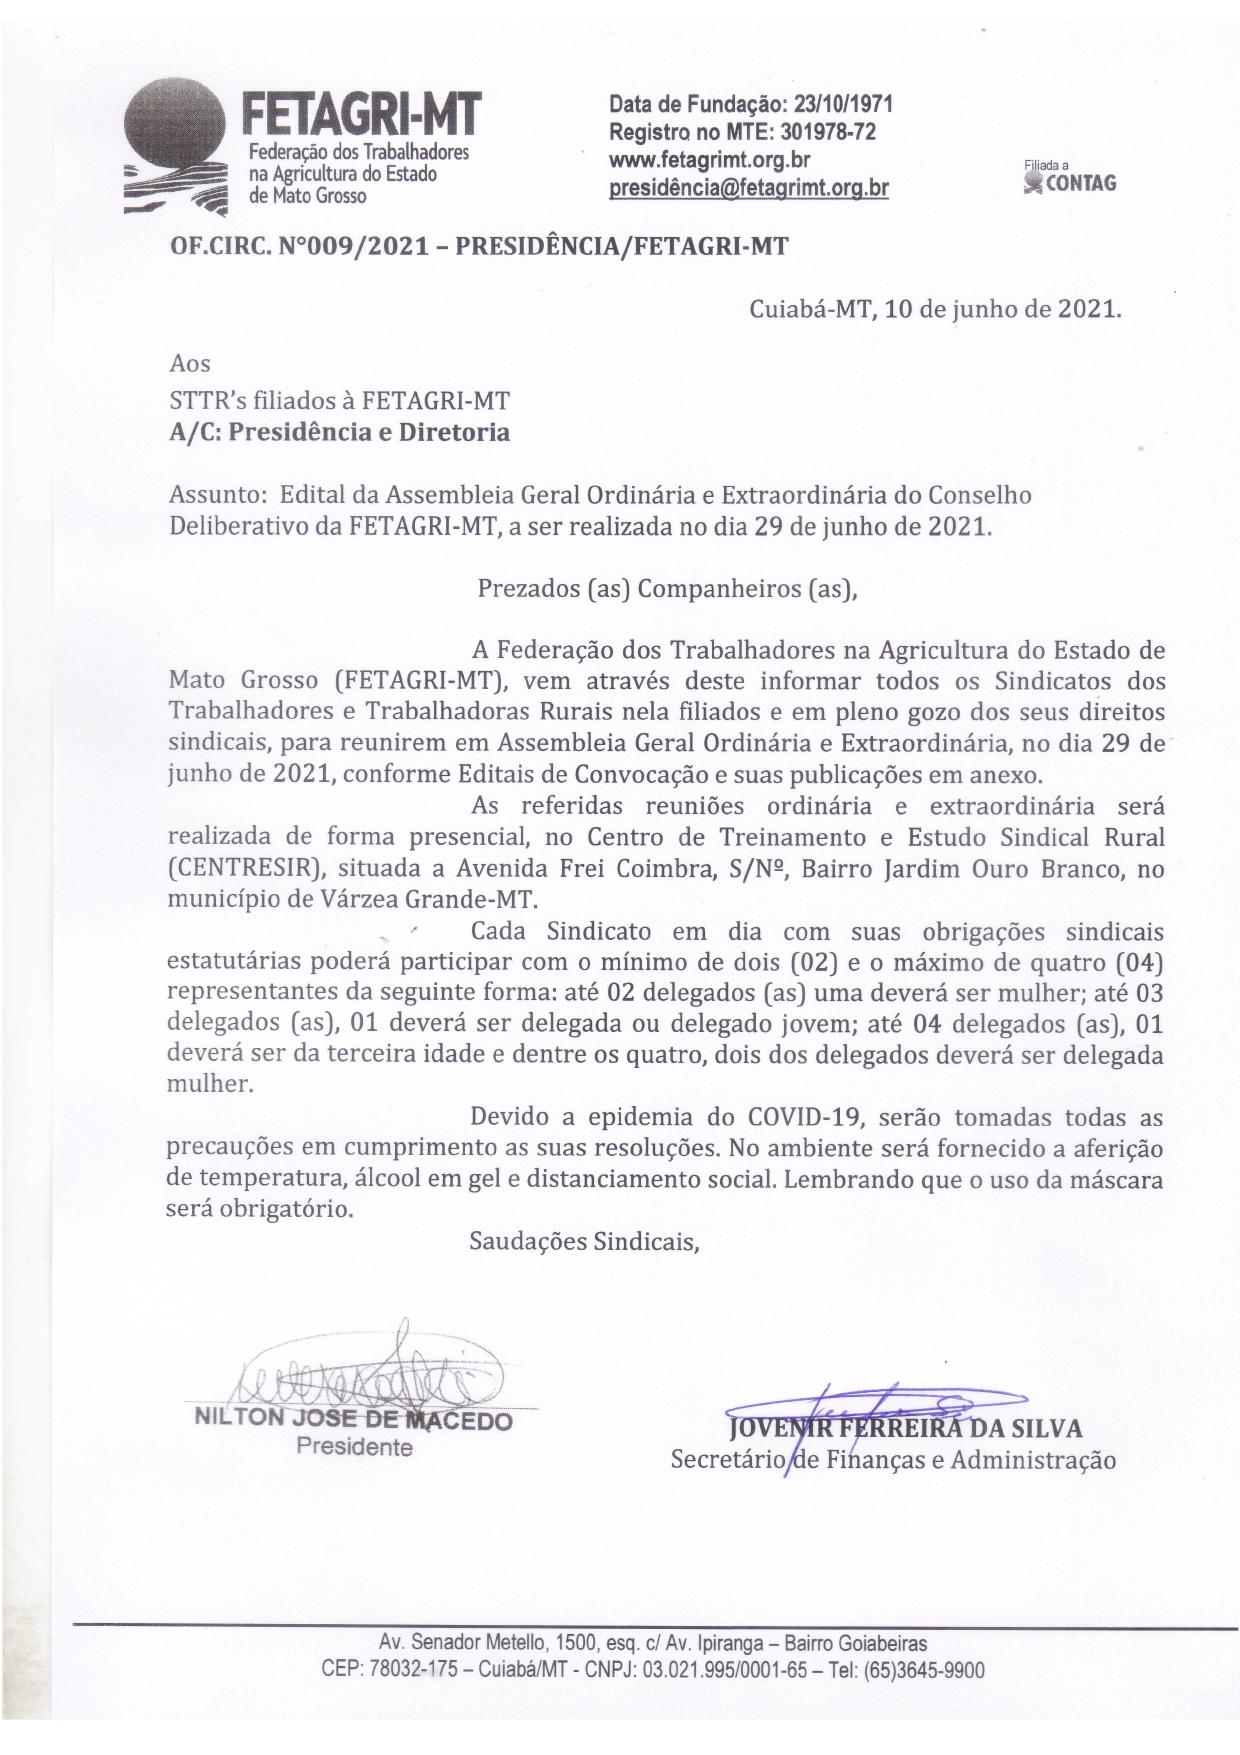 OFÍCIO CIRCULAR 009/2021 - PRESIDÊNCIA/FETAGRI-MT